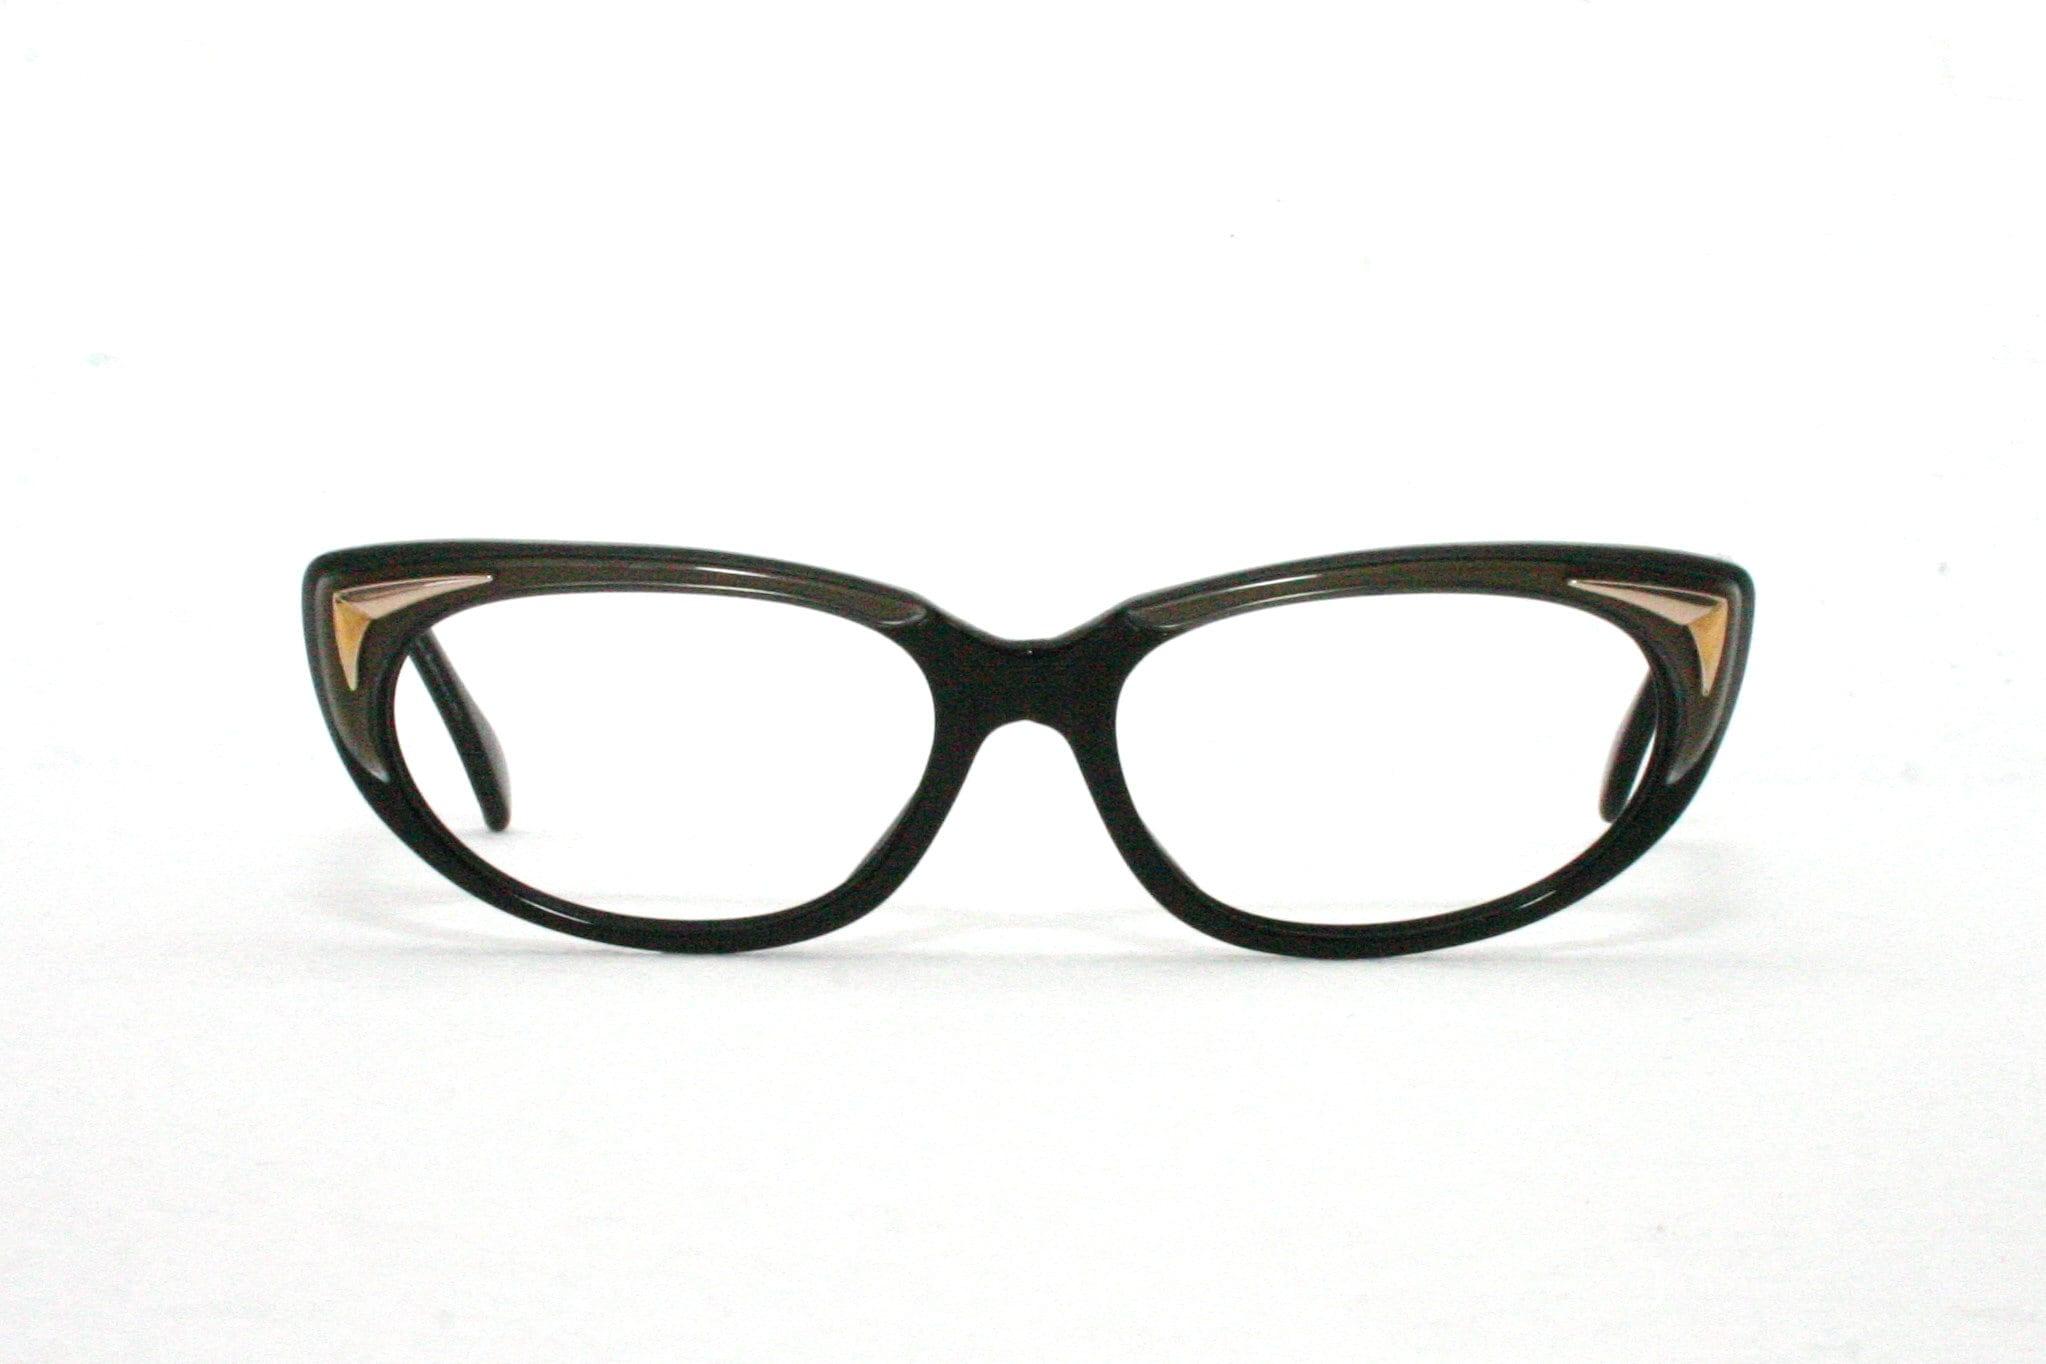 5da45d48b9 Metzler 60 s Cat Eye Sunglasses Small Size Vintage Black